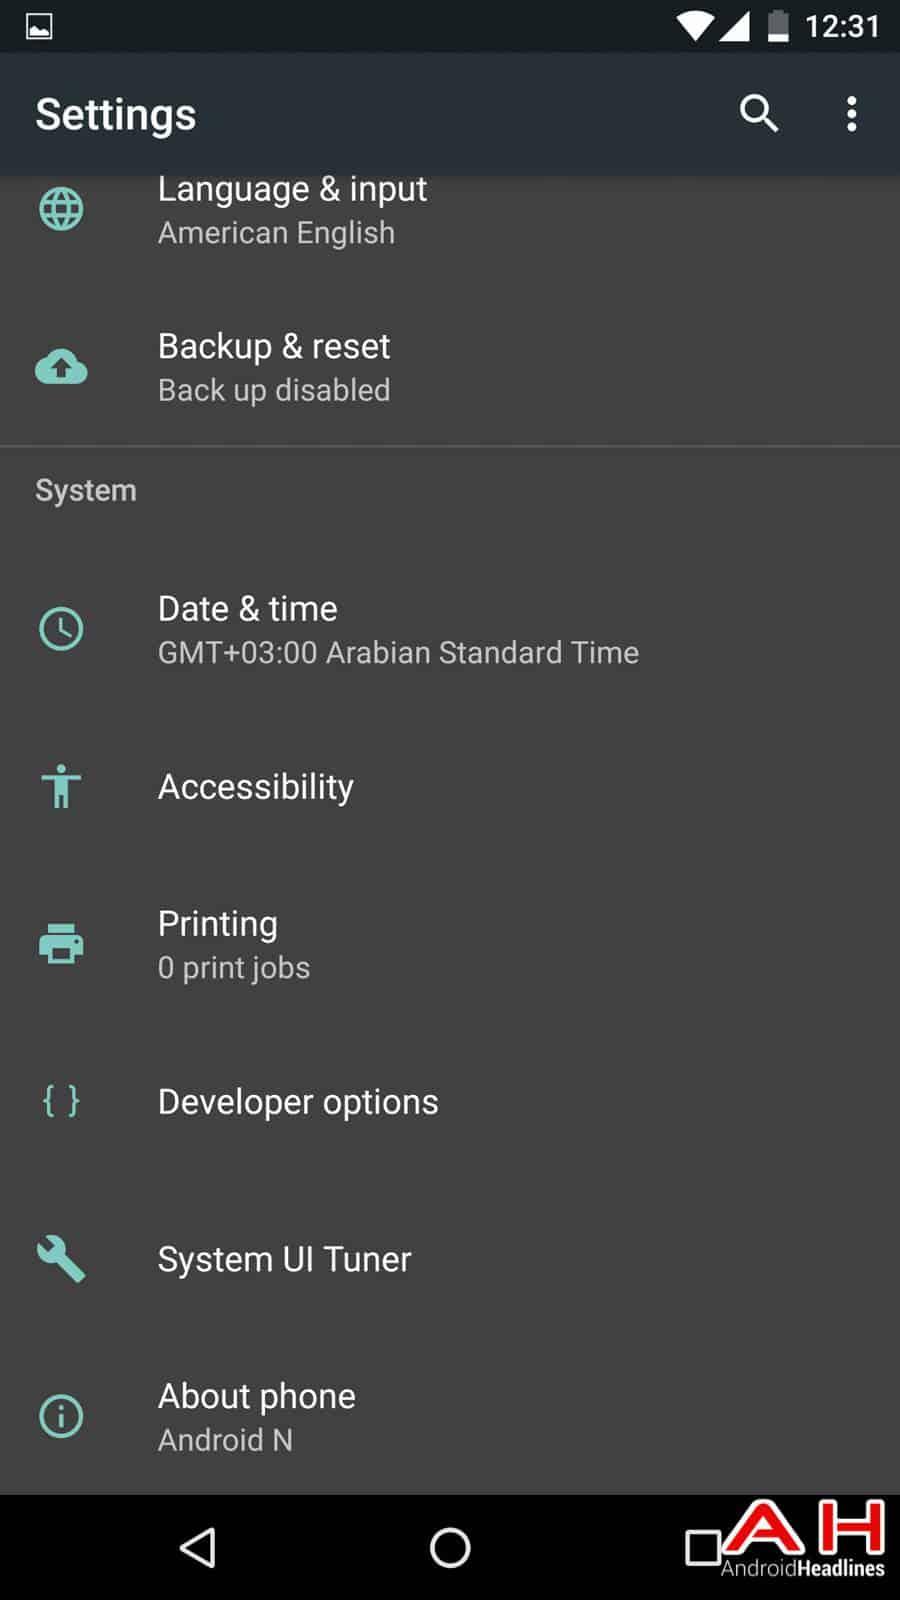 Android N Screenshots AH 003114